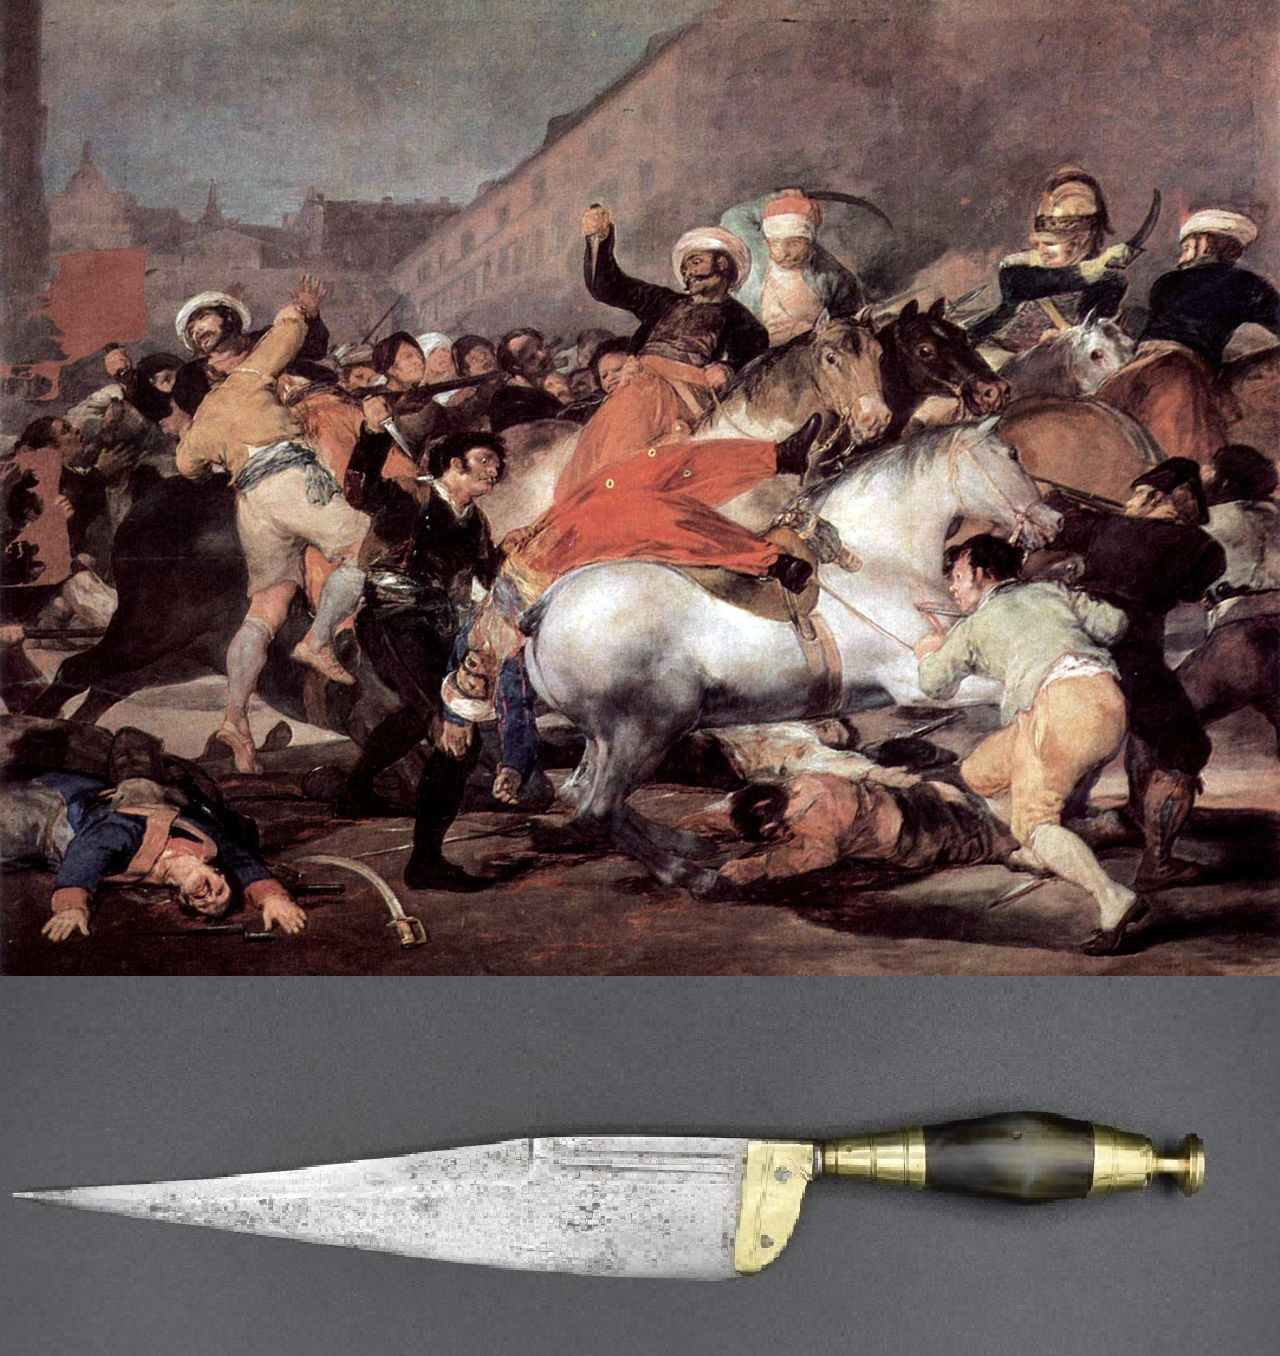 goya mayo 1808 cuchillo español majo